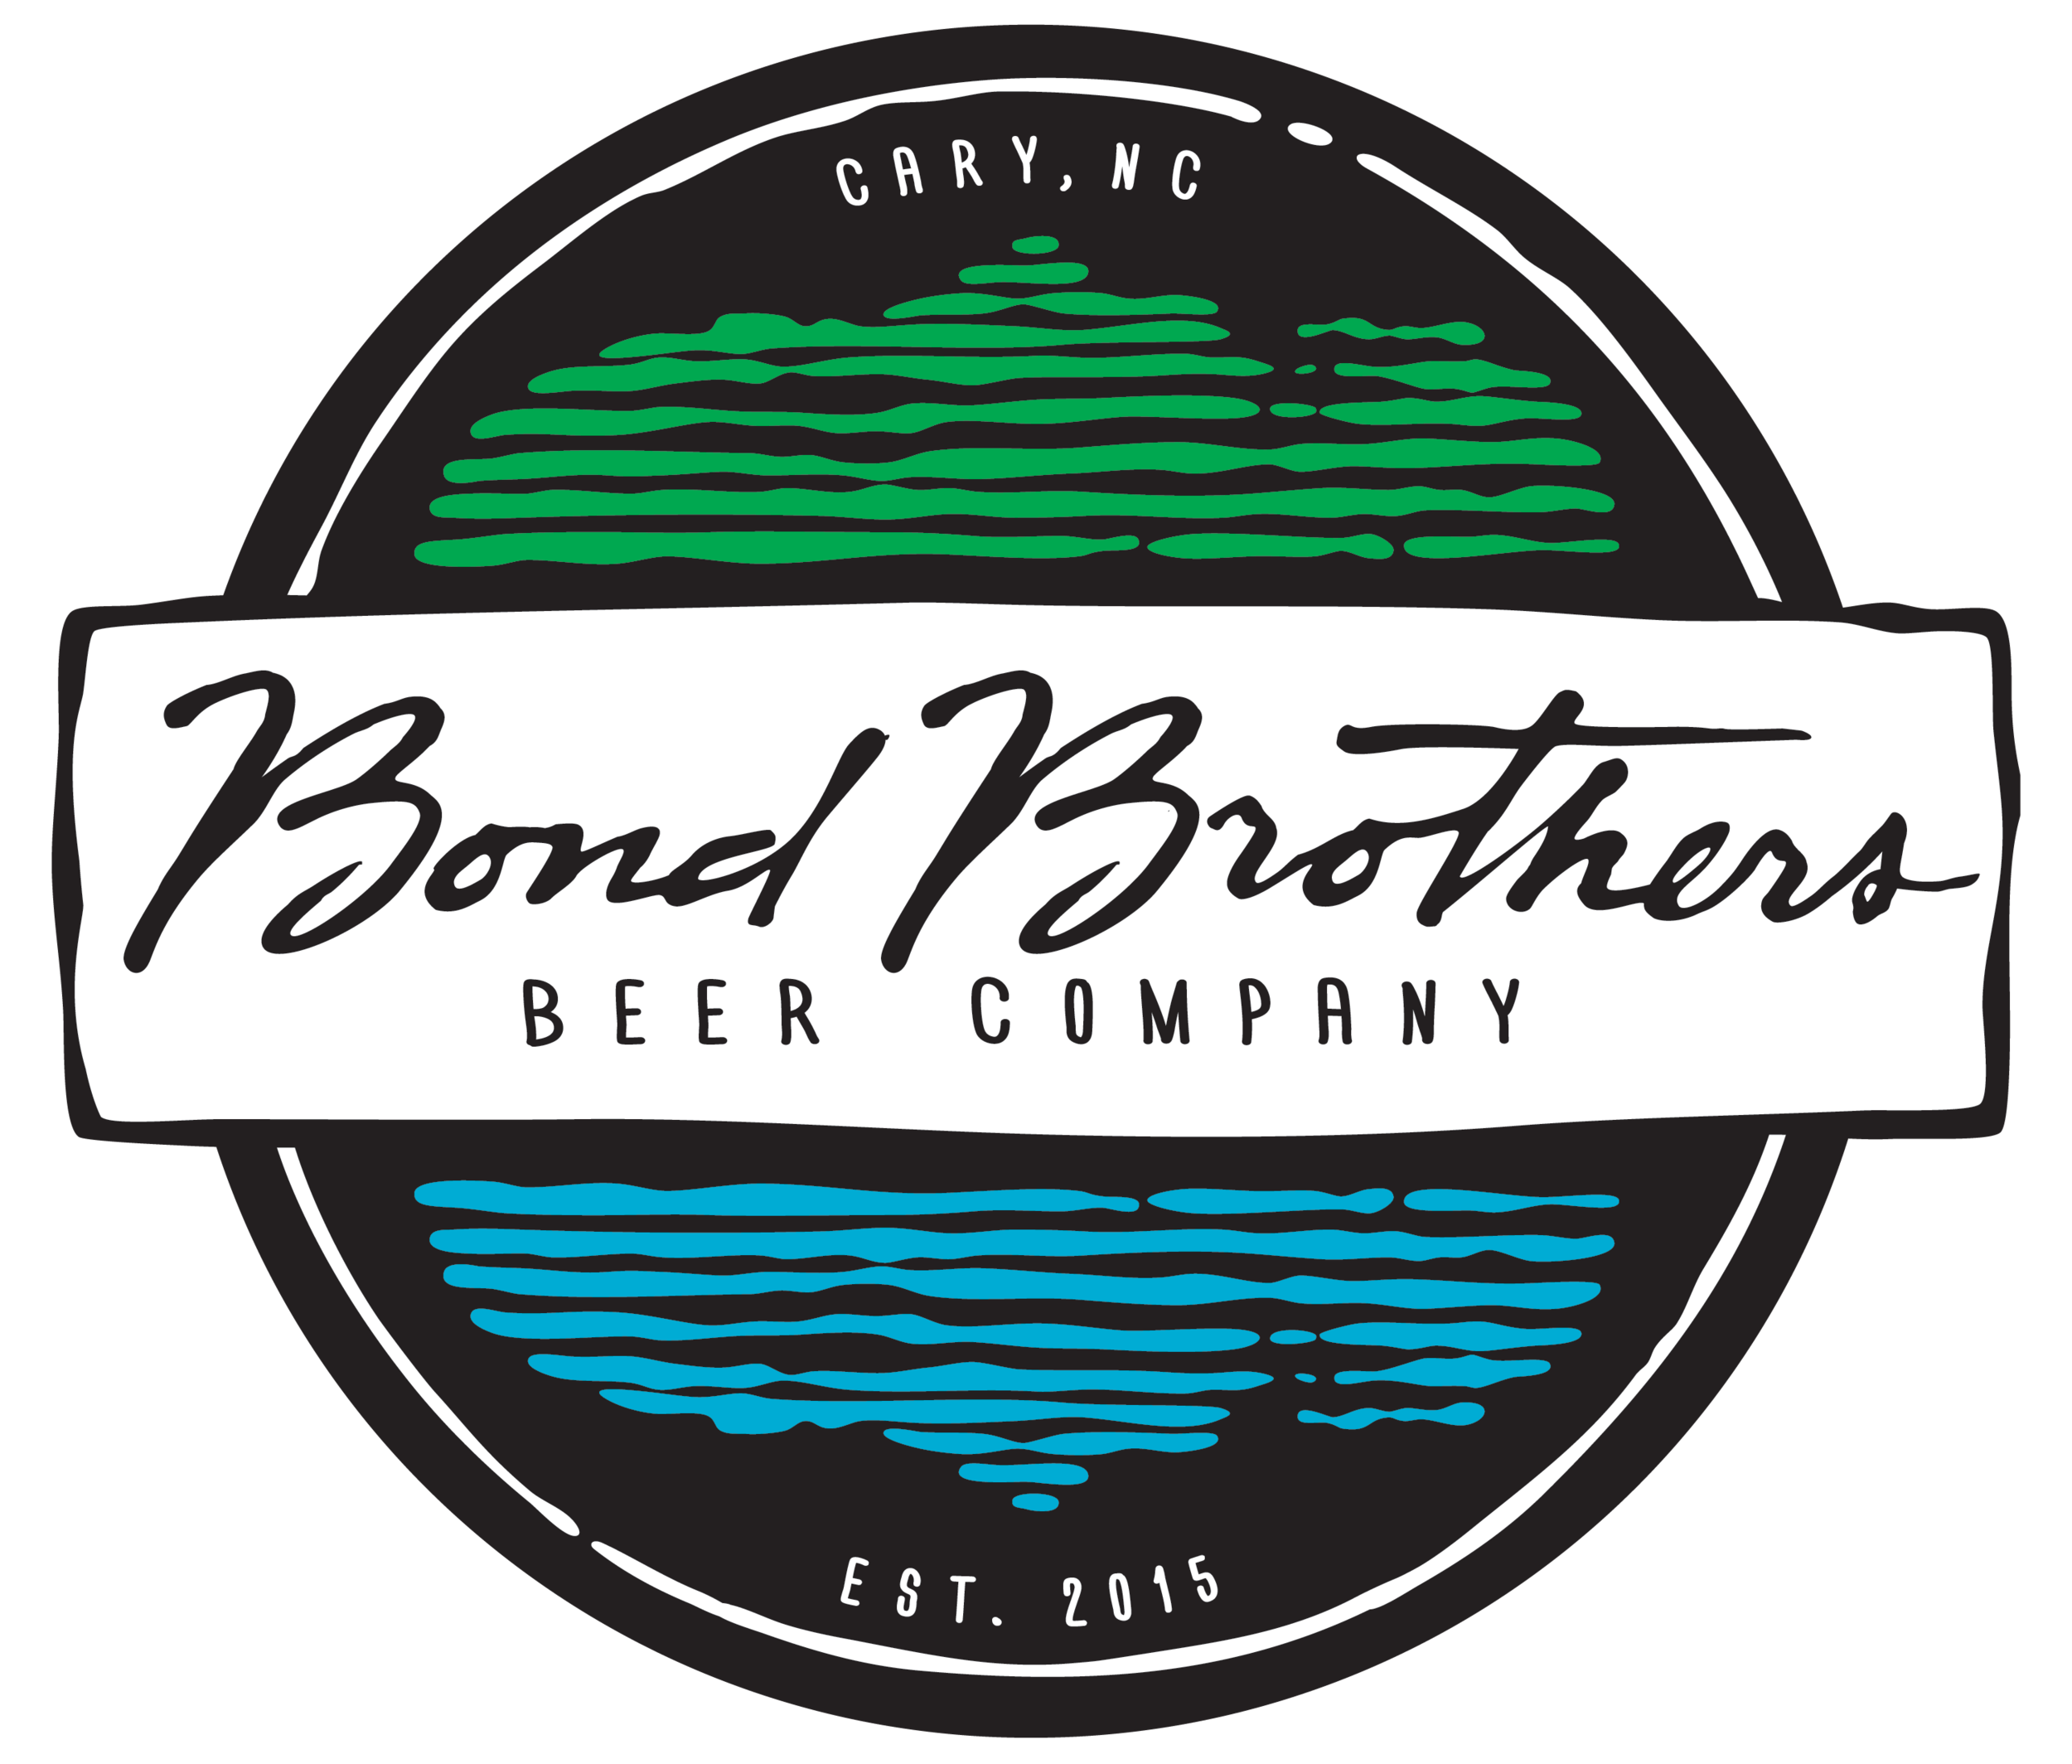 Bond Brothers